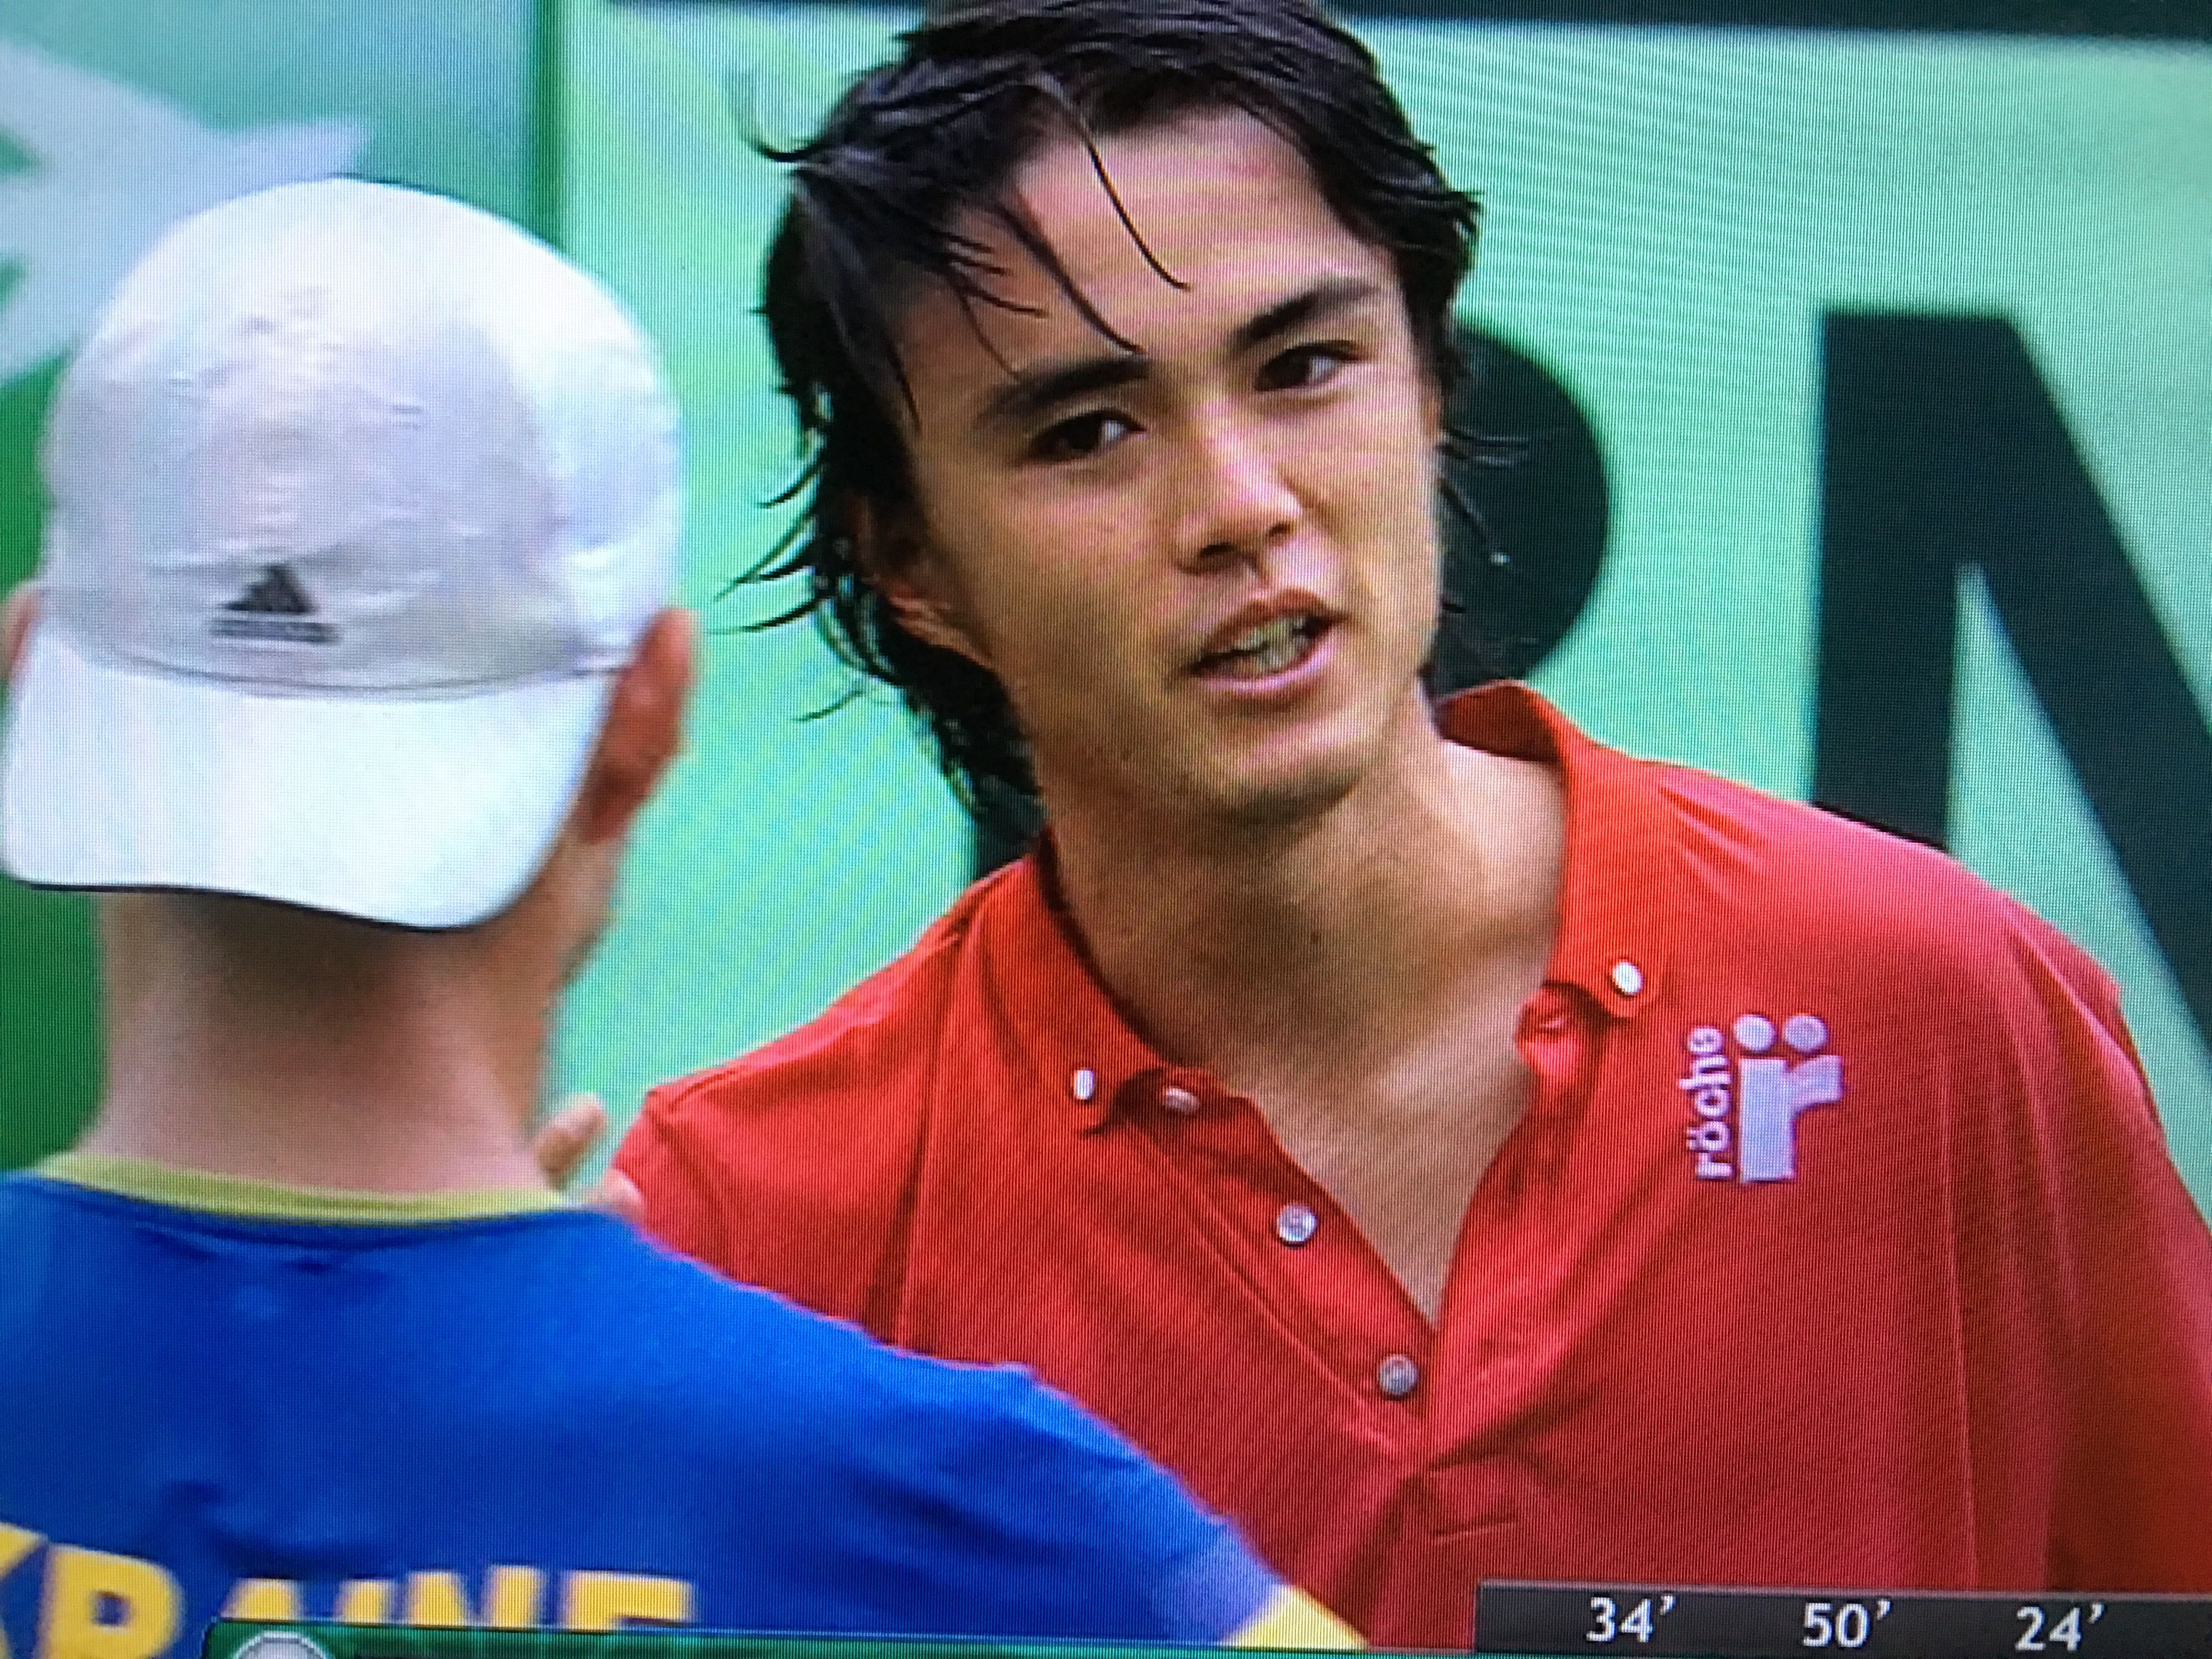 Taro greets at net upon winning at Davis Cup 2016